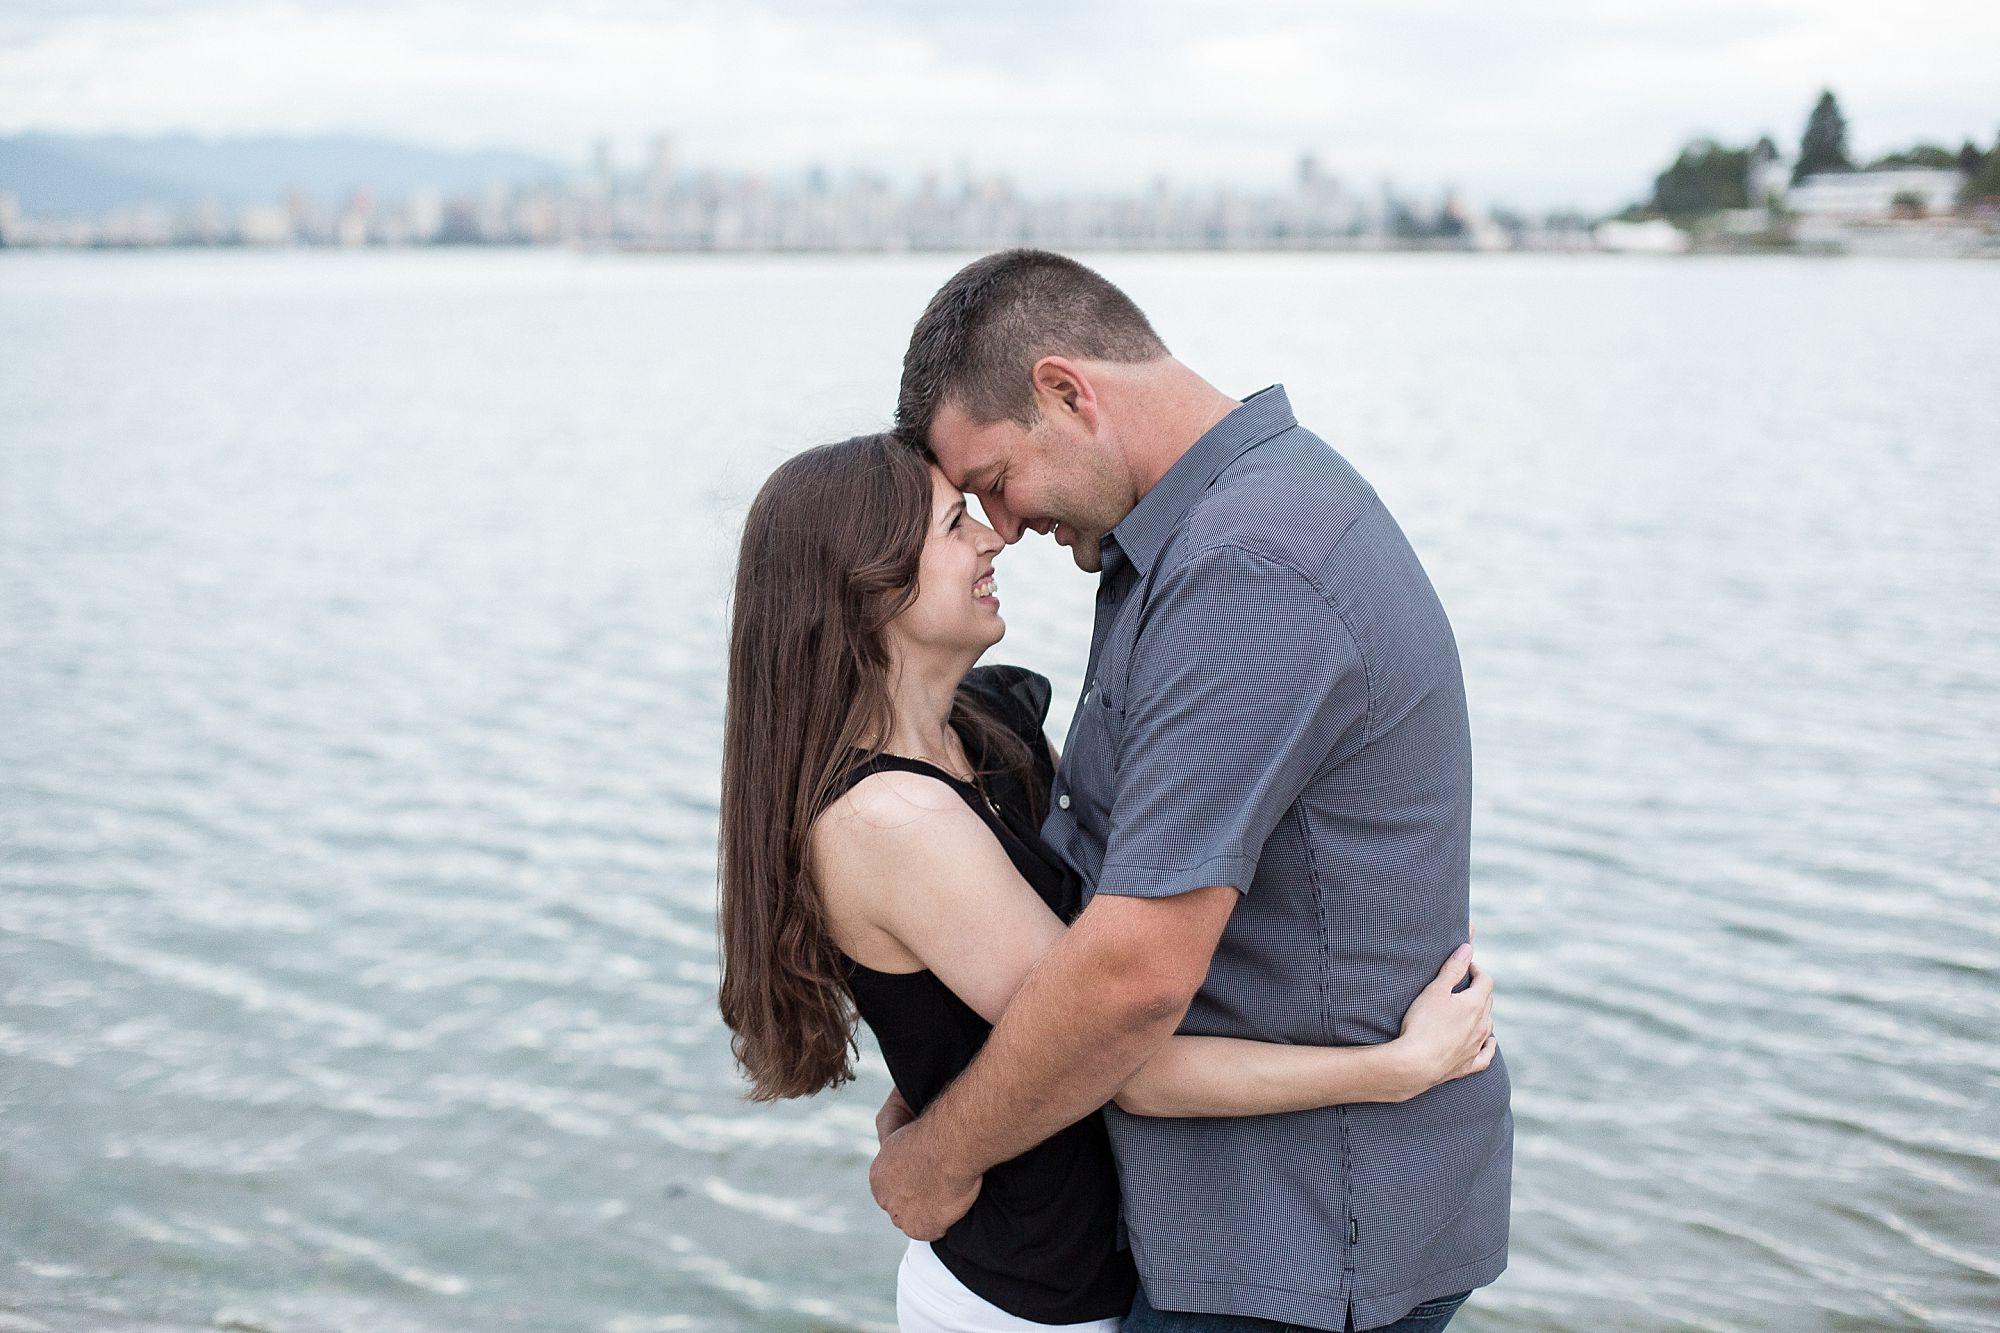 Vancouver Wedding Photography Hayley Rae Photography Associate_0006.jpg